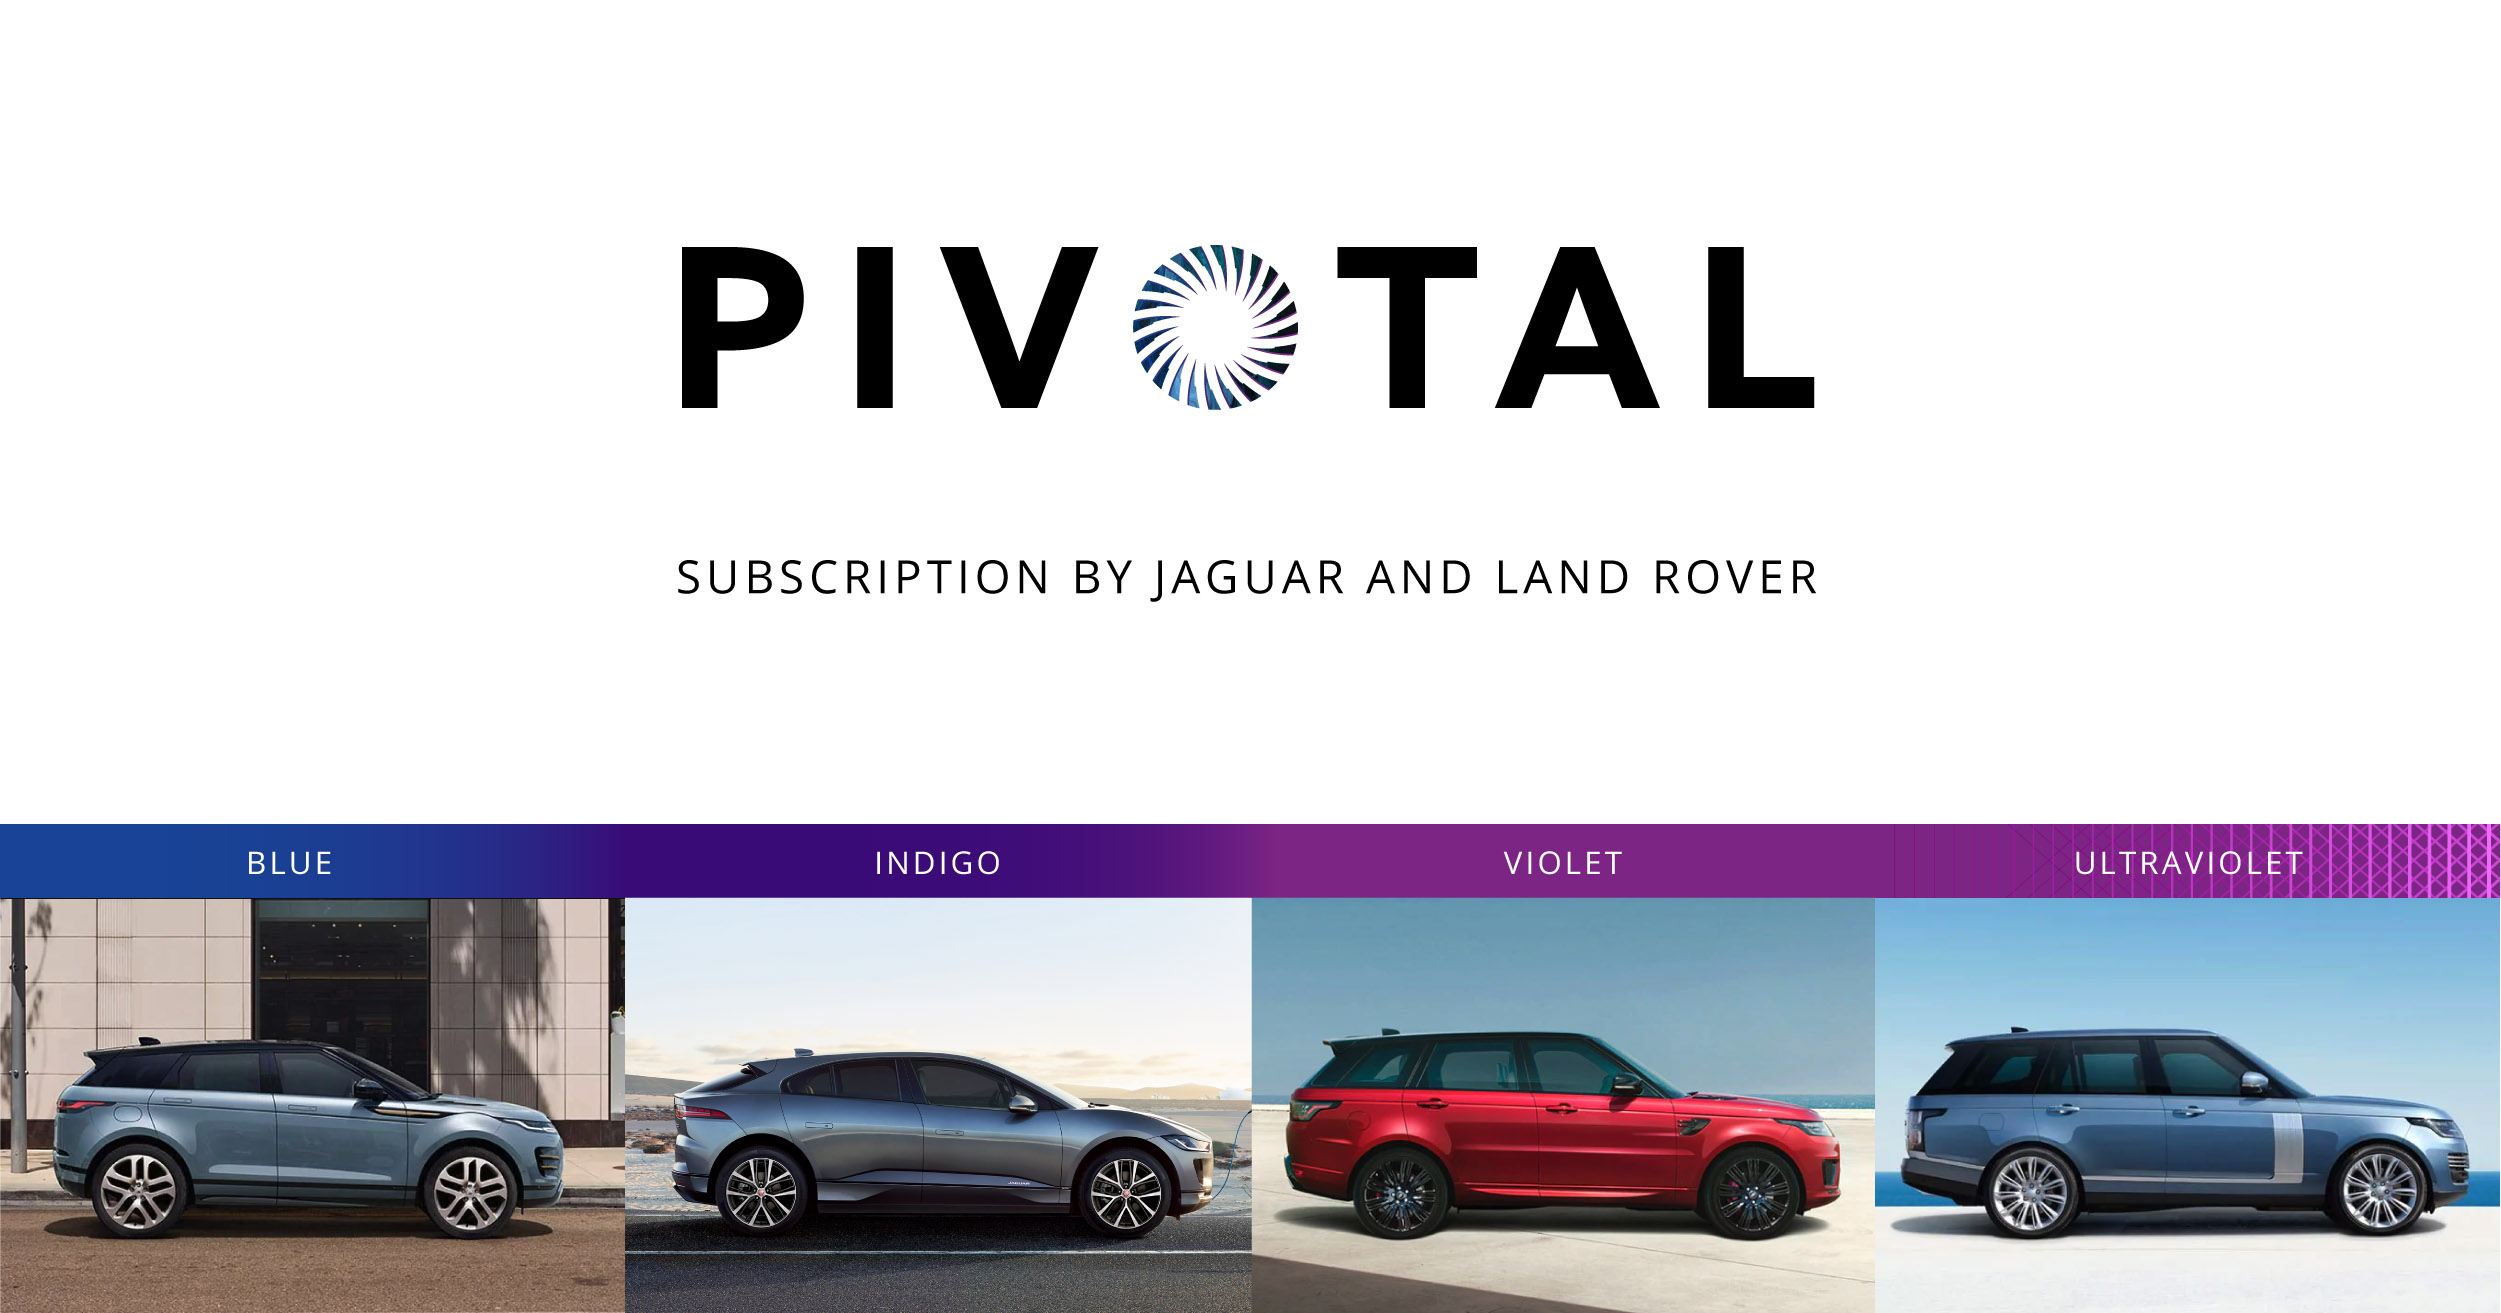 358111 elektrisch of offroad jaguar land rover en pivotal bieden de keuze 2e32a8 original 1593606769